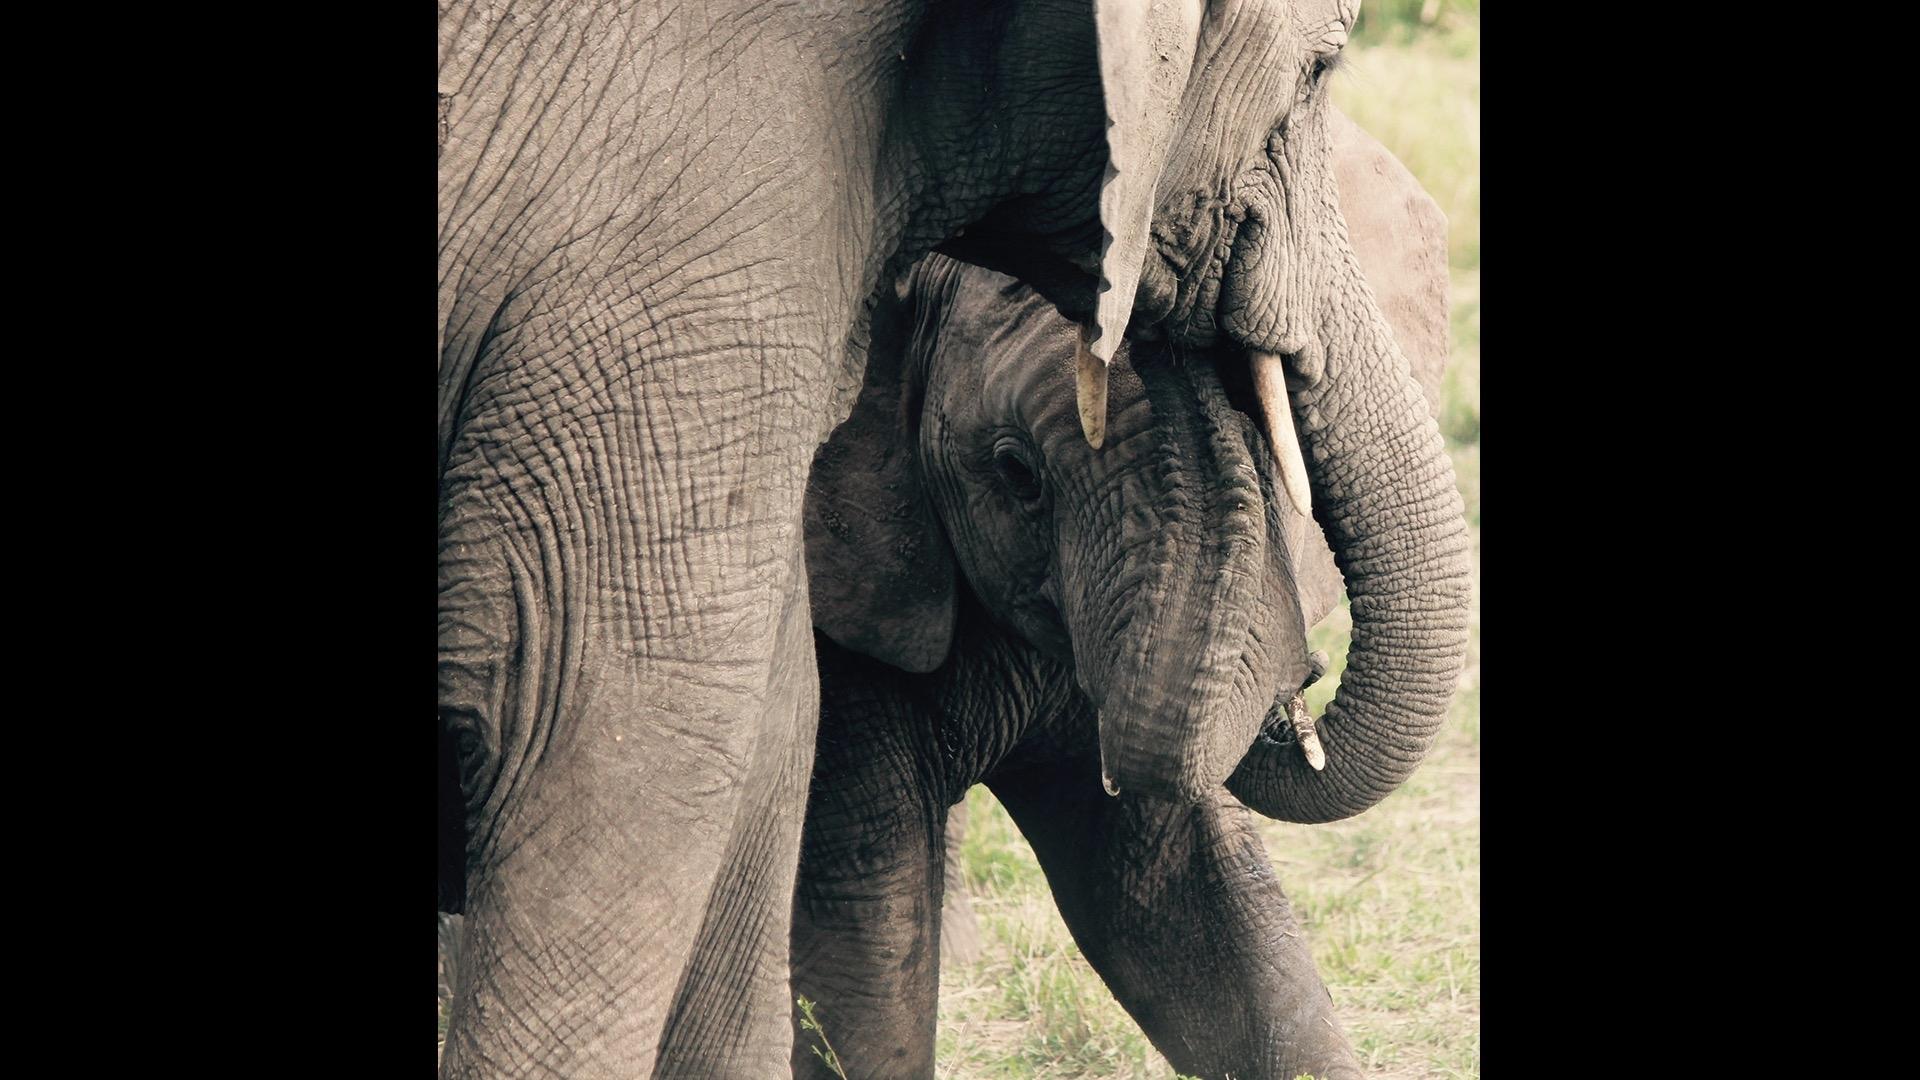 mother nuzzling baby elephant